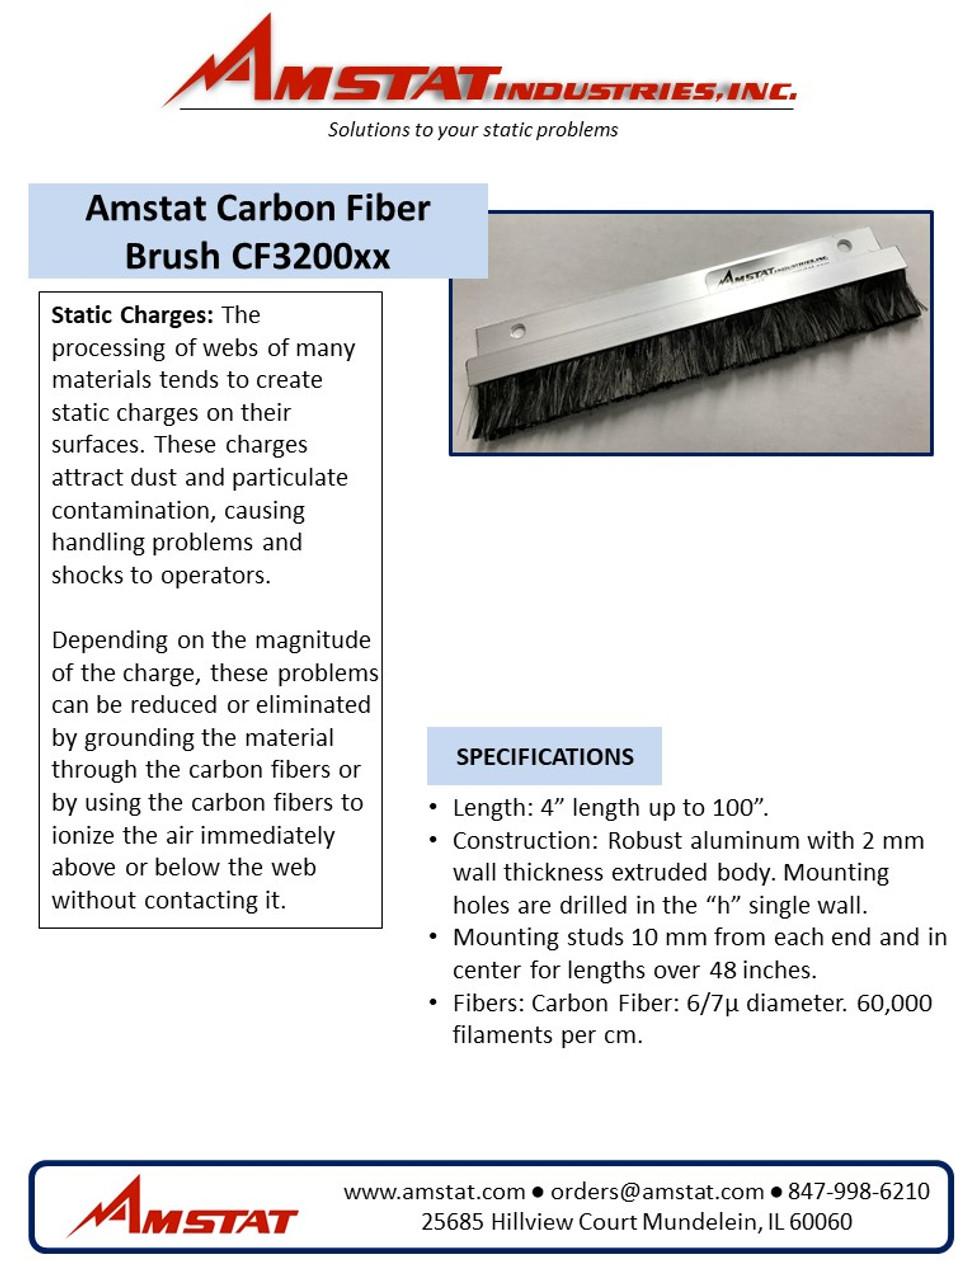 Carbon Fiber Brushes (30mm bristles) - $6.00/inch